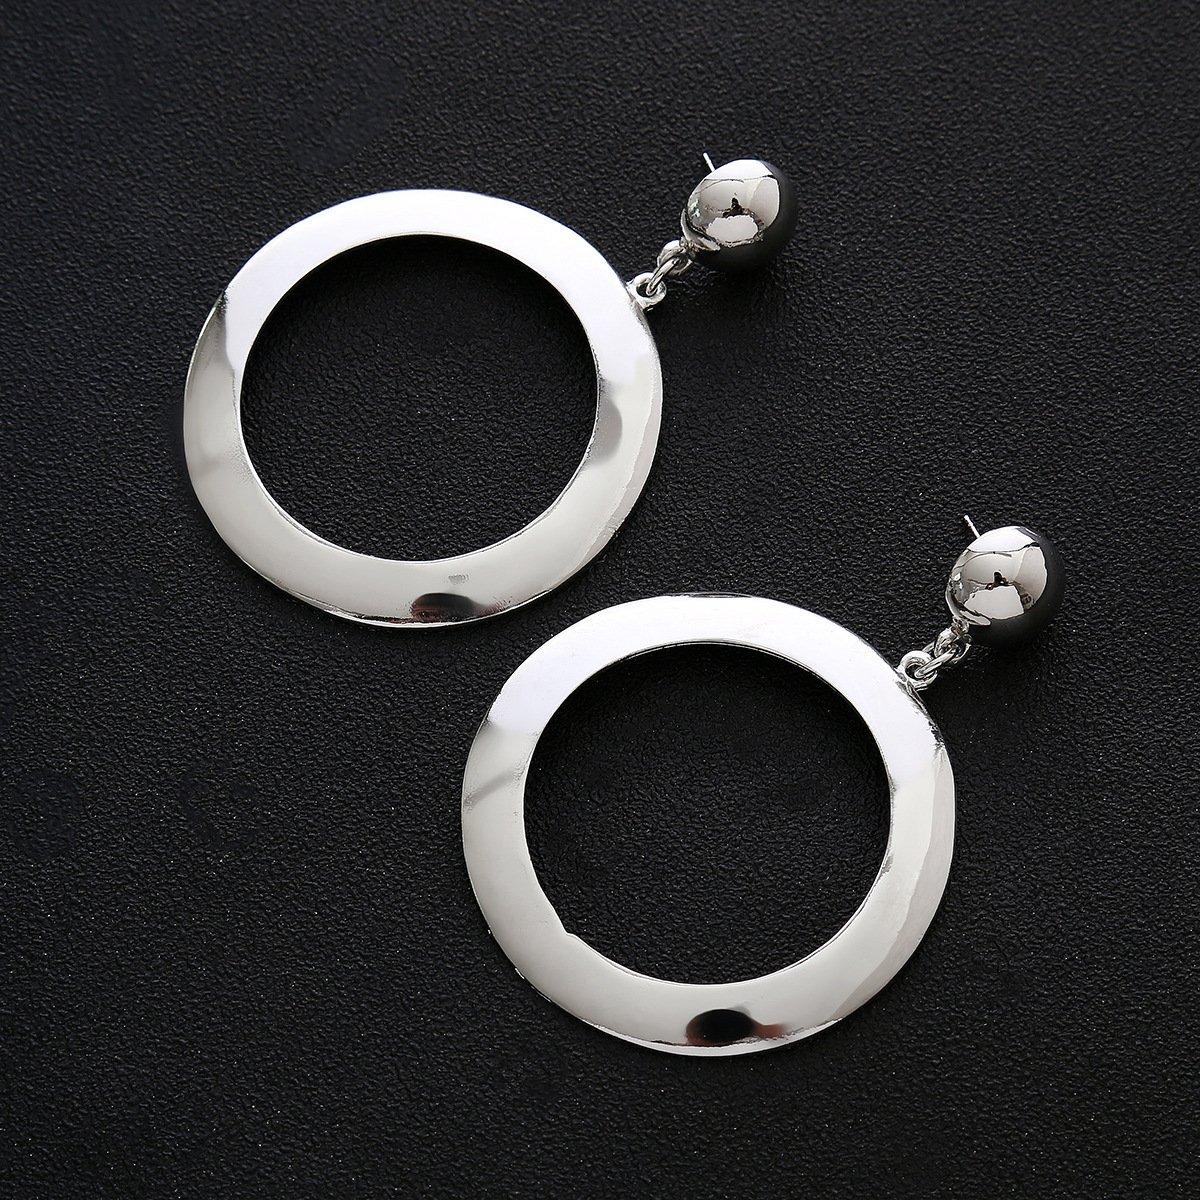 CHOA Big Hoops Earrings-Fashion Simple Earrings for Ladies and Cool Girls